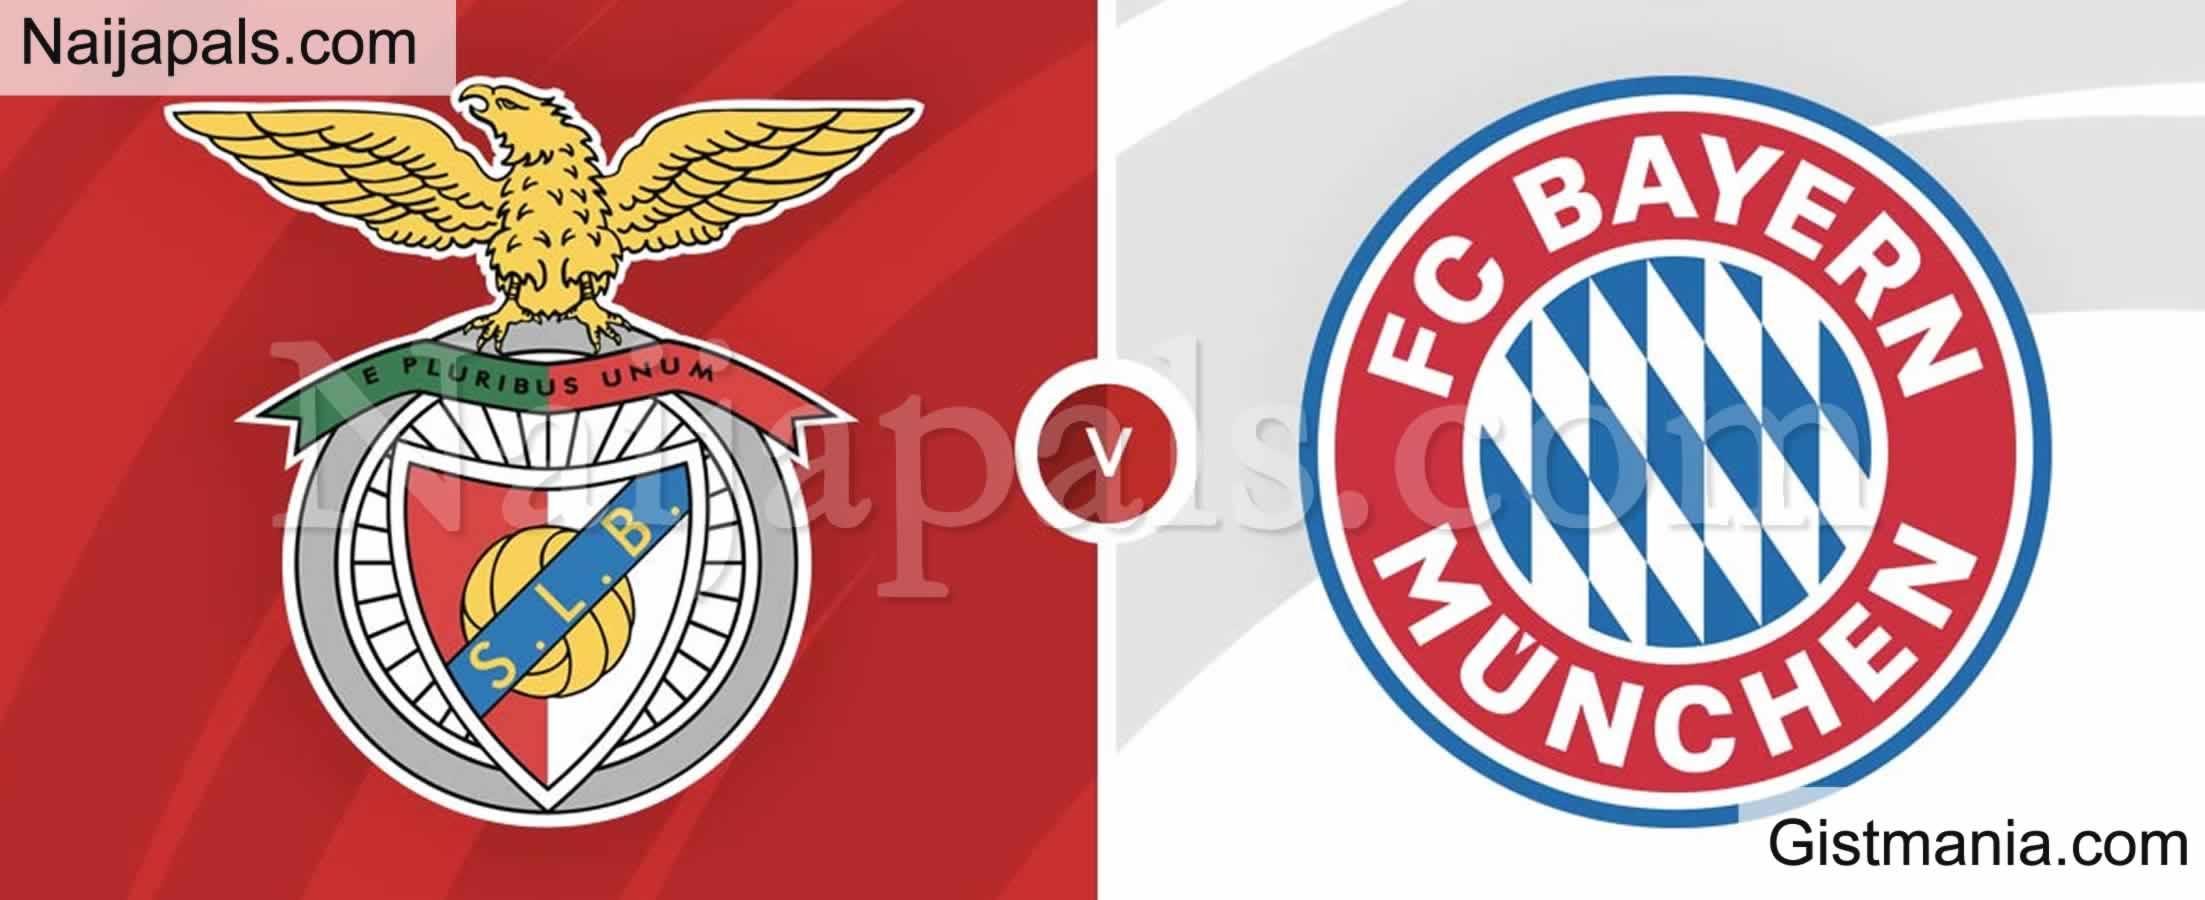 <img alt='.' class='lazyload' data-src='https://img.gistmania.com/emot/soccer.gif' /> <b>Benfica v Bayern Munich : UEFA Champion's League Match, Team News, Goal Scorers and Stats</b>